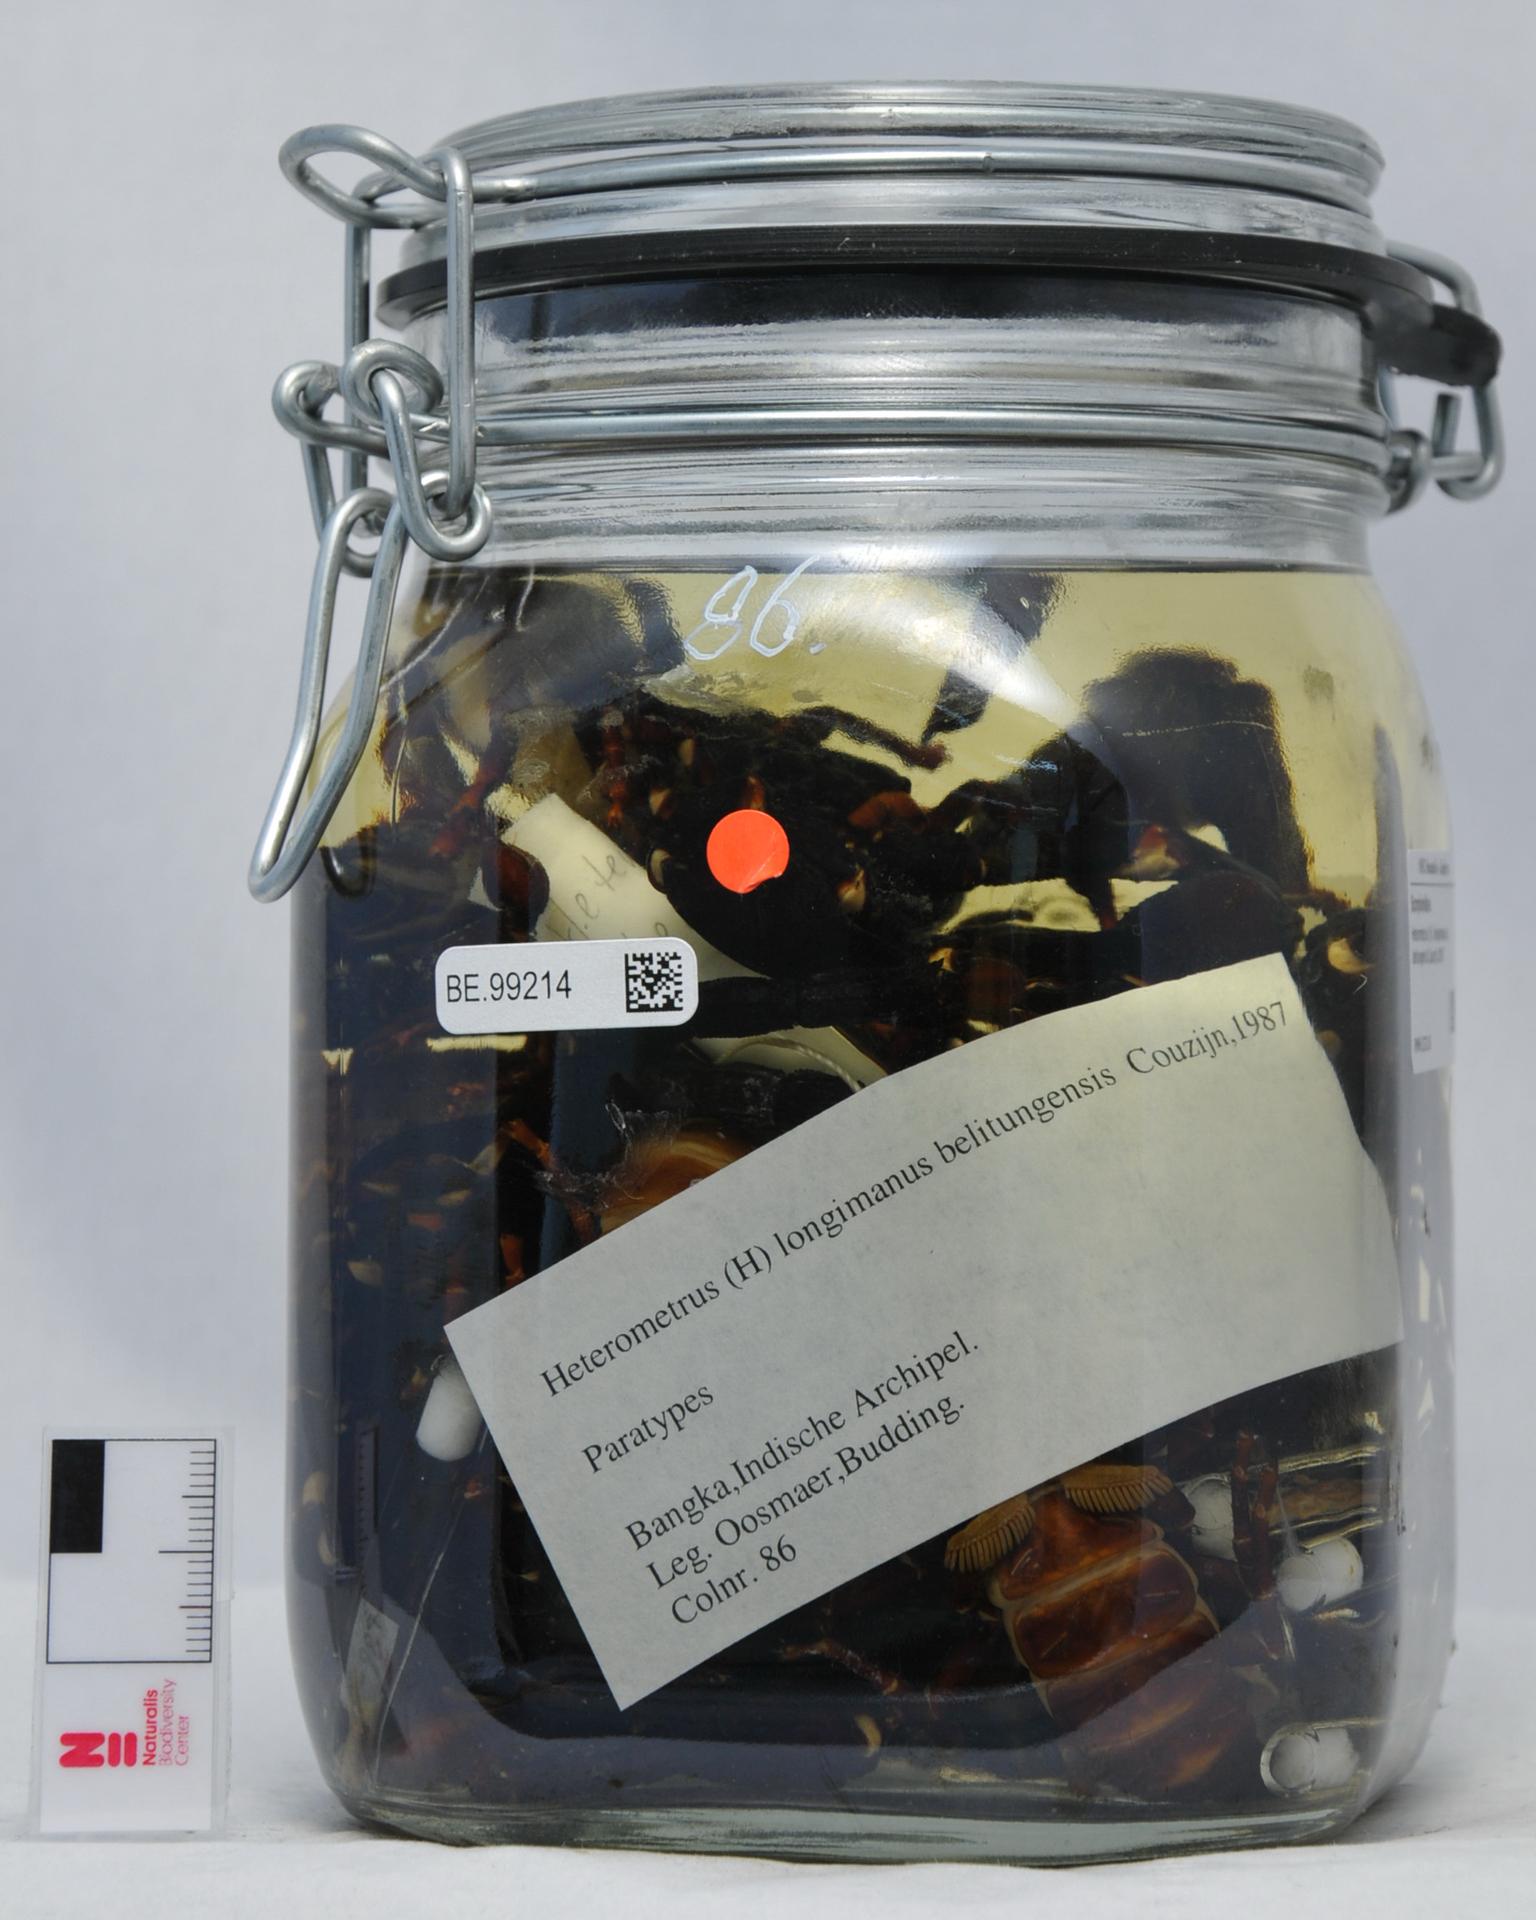 RMNH.SCO.86 | Heterometrus (H.) longimanus belitungensis Couzijn,1981